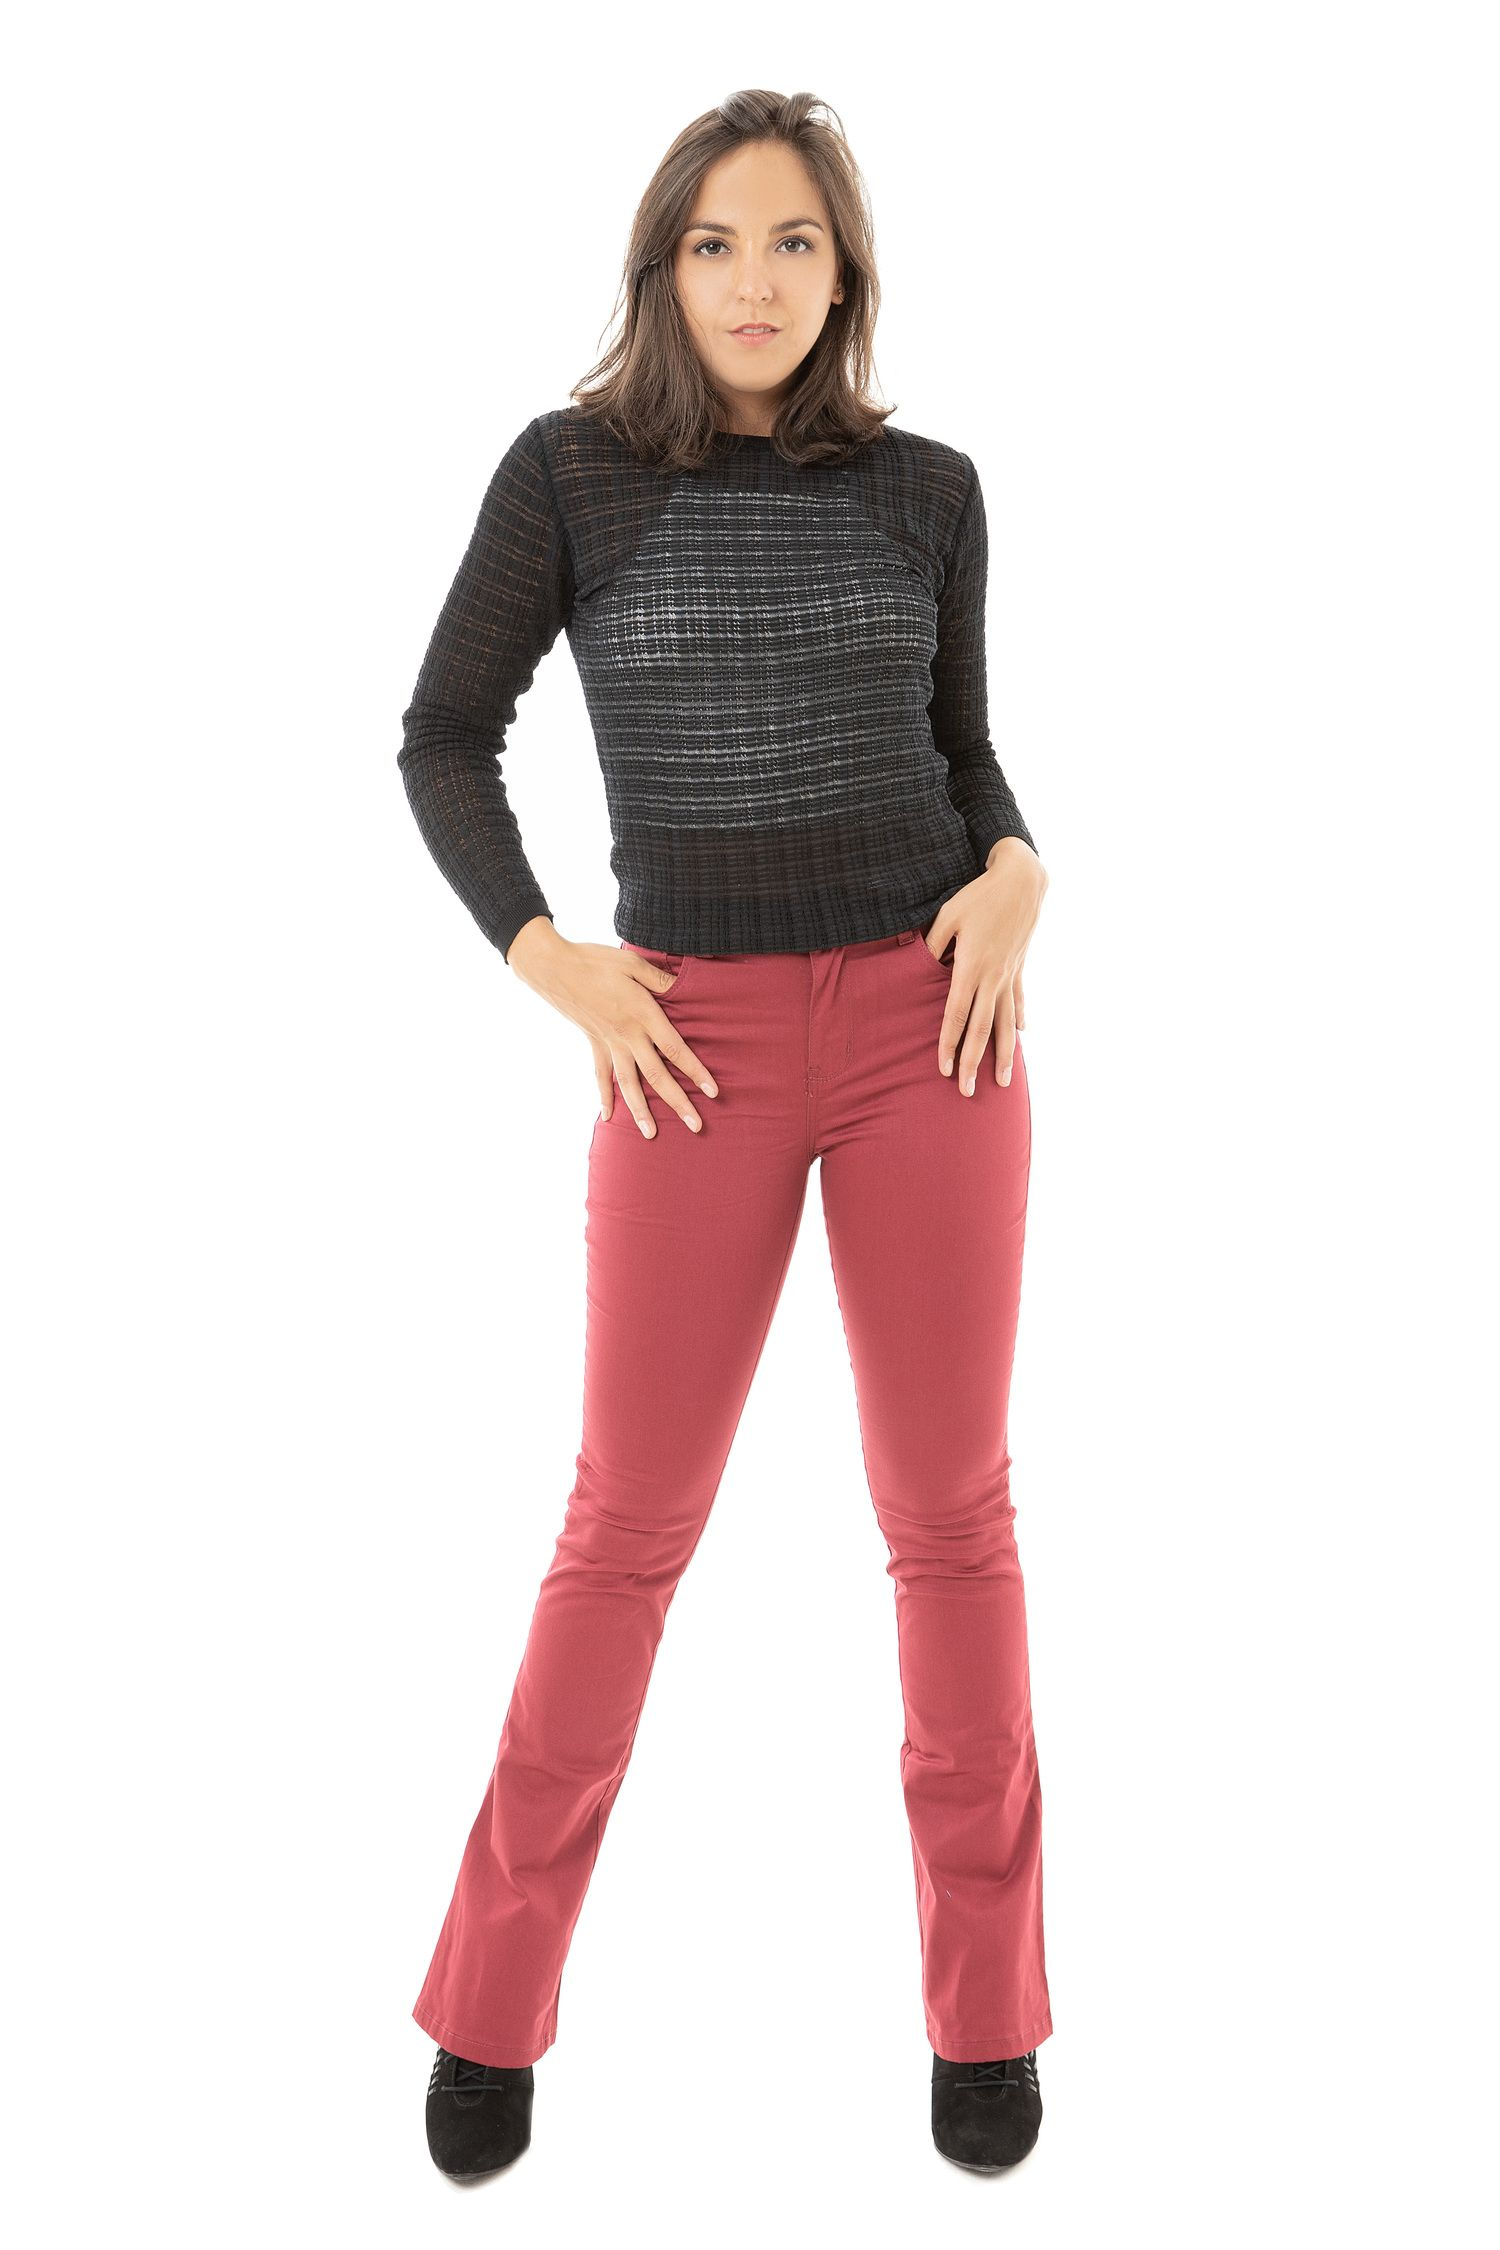 Calça Sarja Flare Feminina Fact Jeans ref. 03694 - Vinho